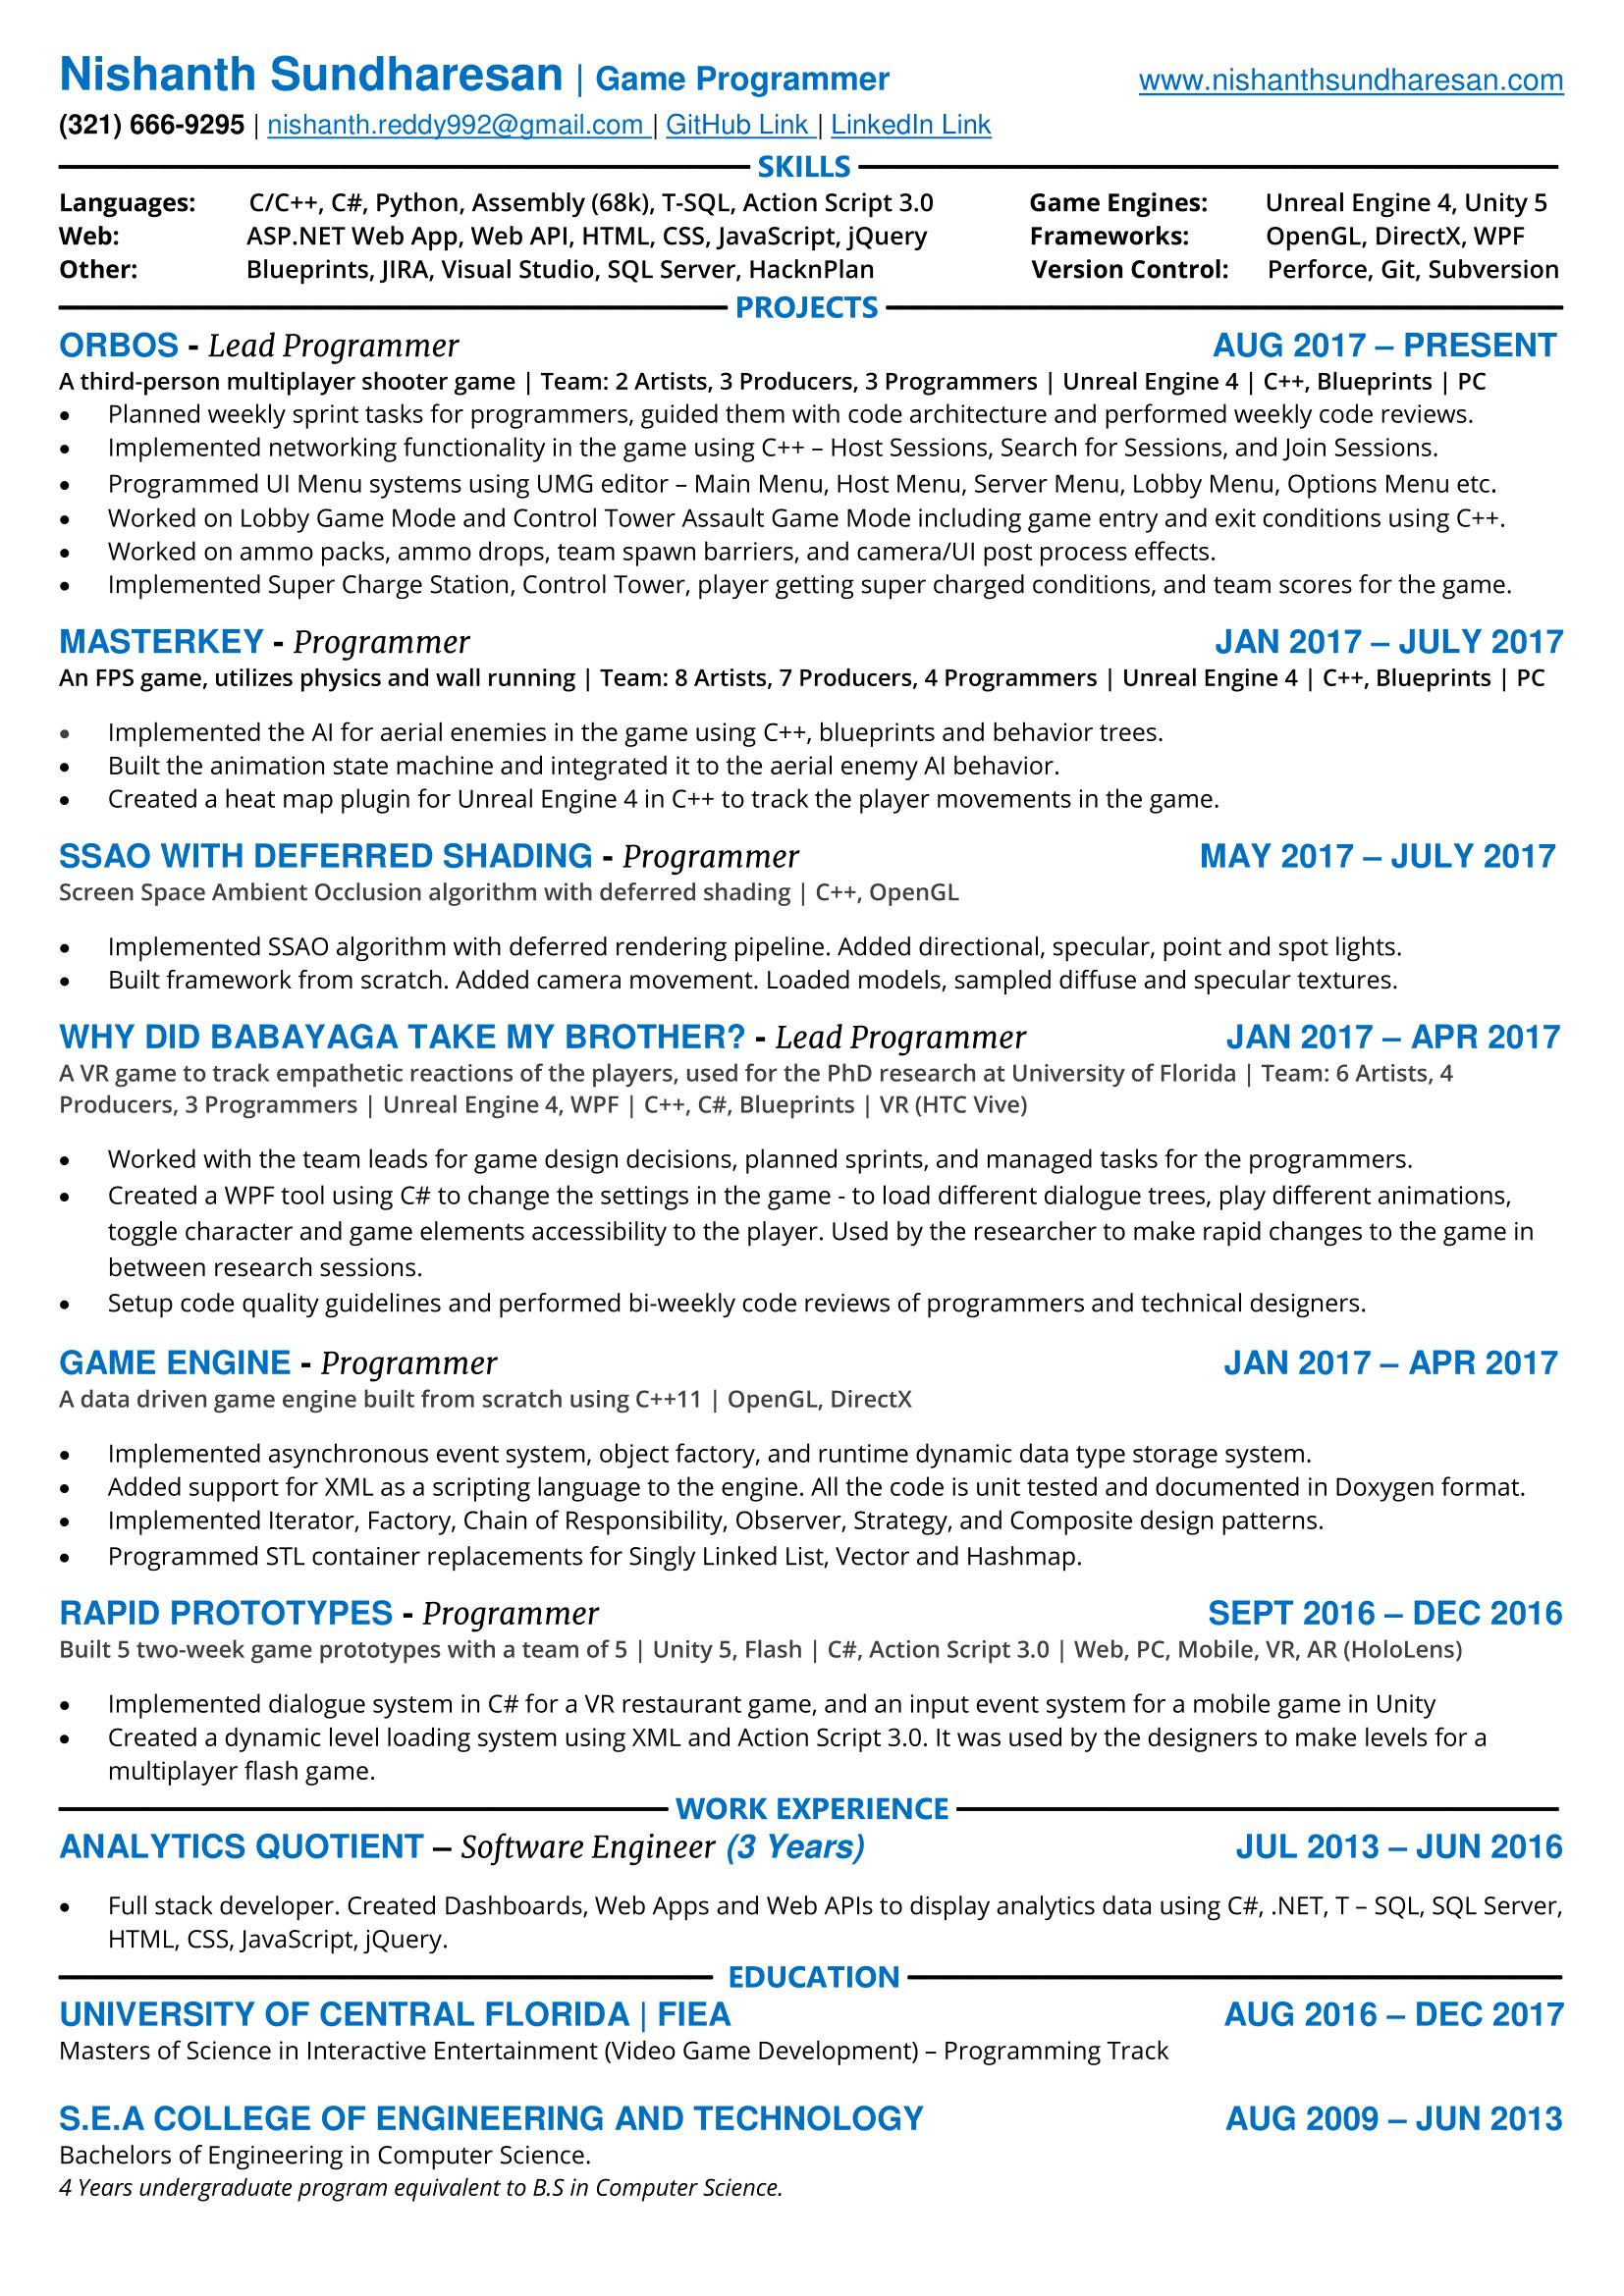 resume nishanth sundharesan - Resume Heat Map